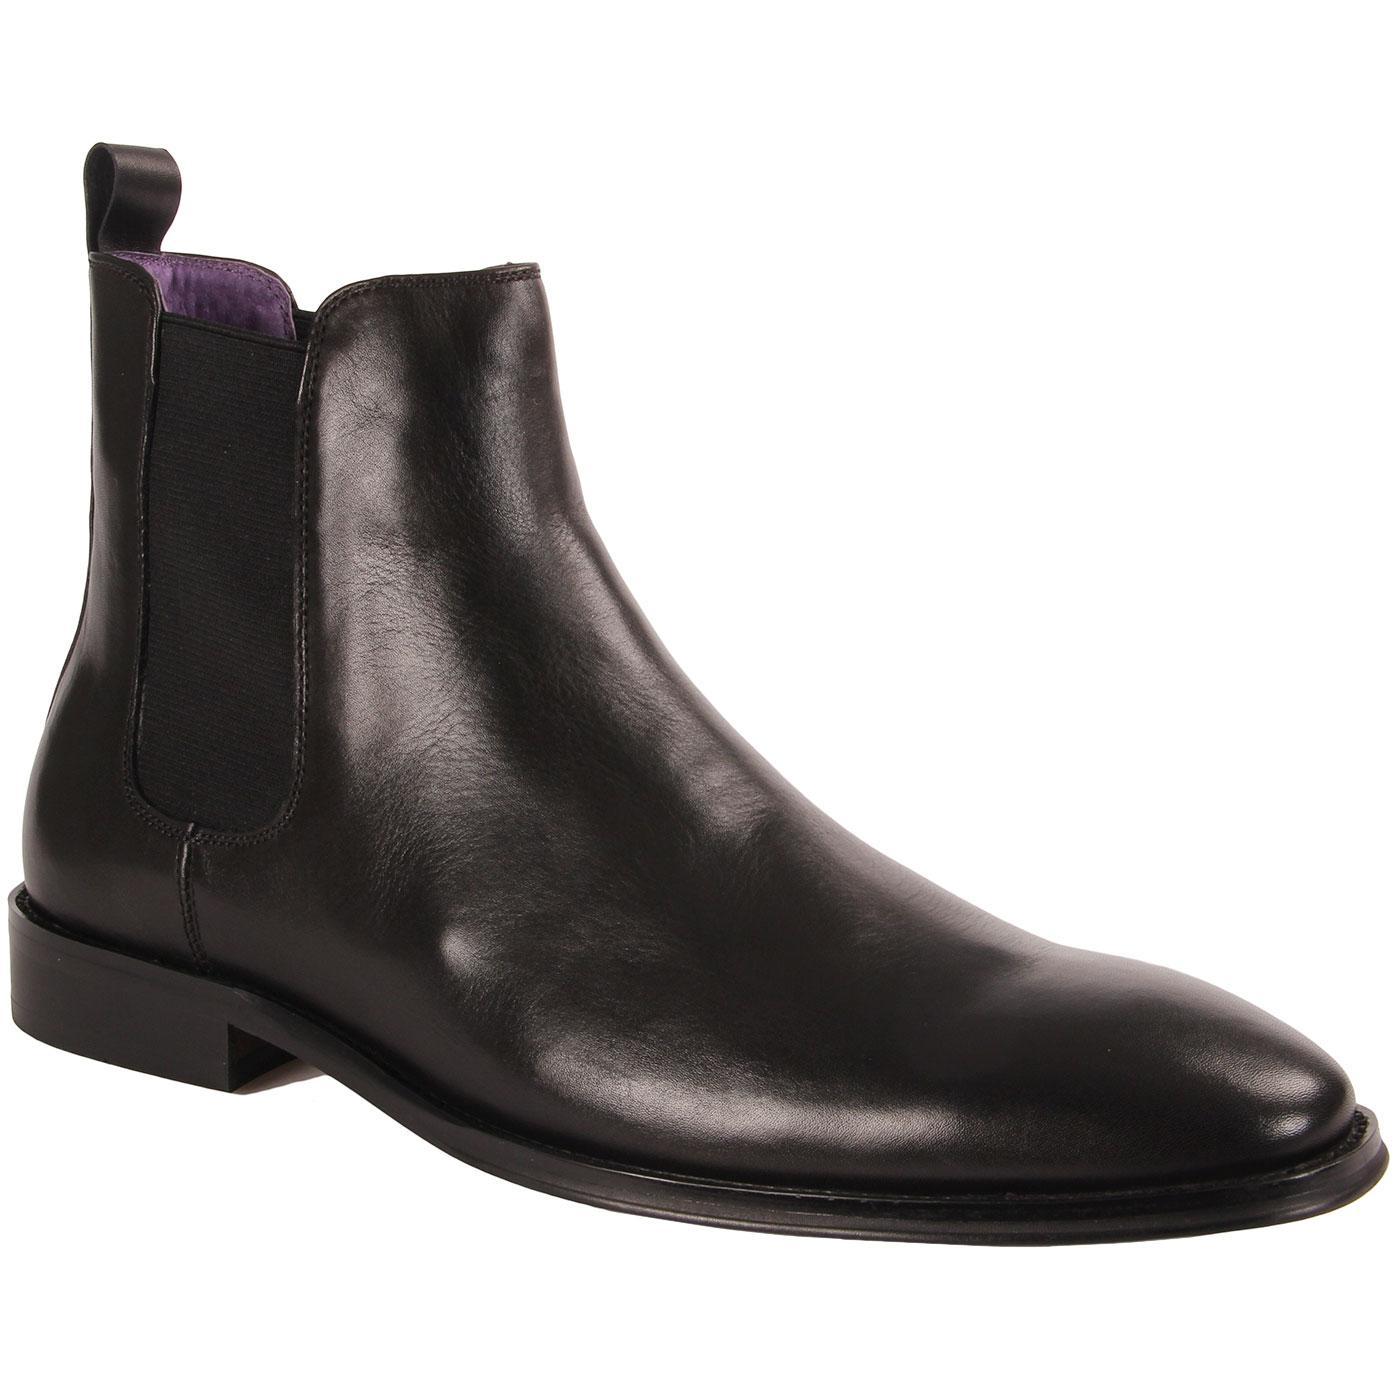 Edsel PAOLO VANDINI 1960s Mod Chelsea Boots BLACK